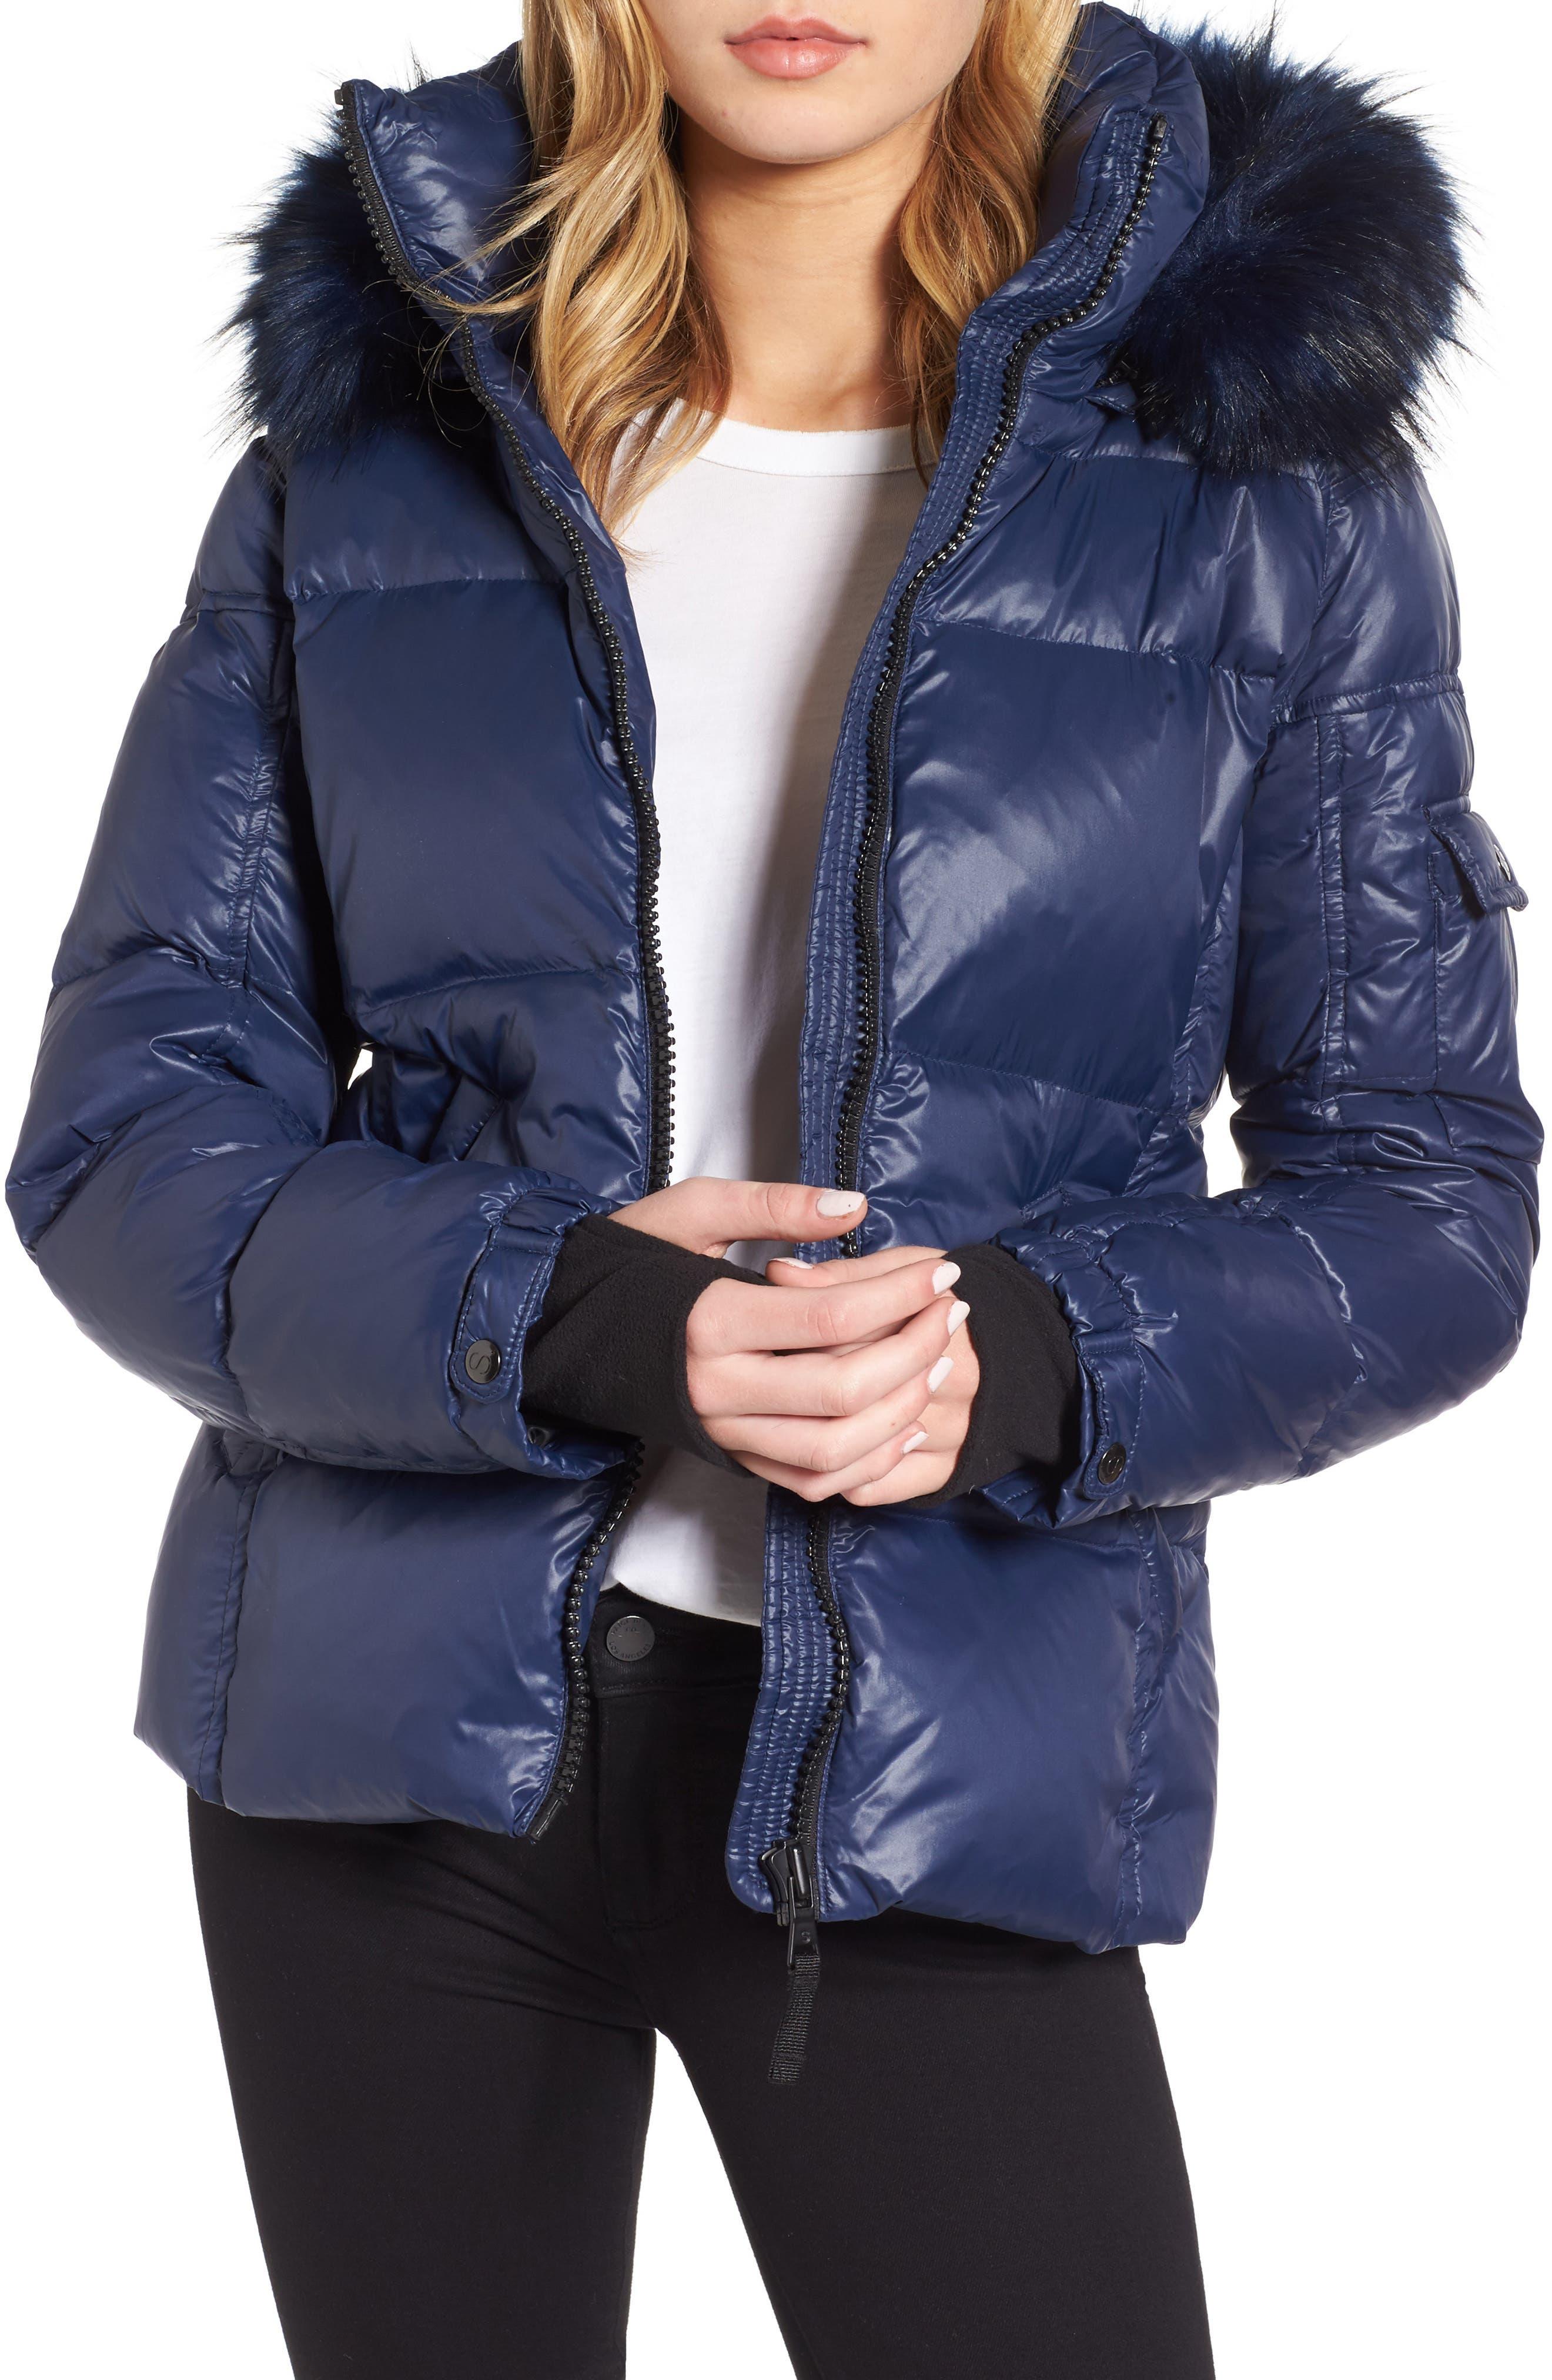 Kylie Faux Fur Trim Gloss Puffer Jacket,                             Main thumbnail 1, color,                             Night Blue/ Navy